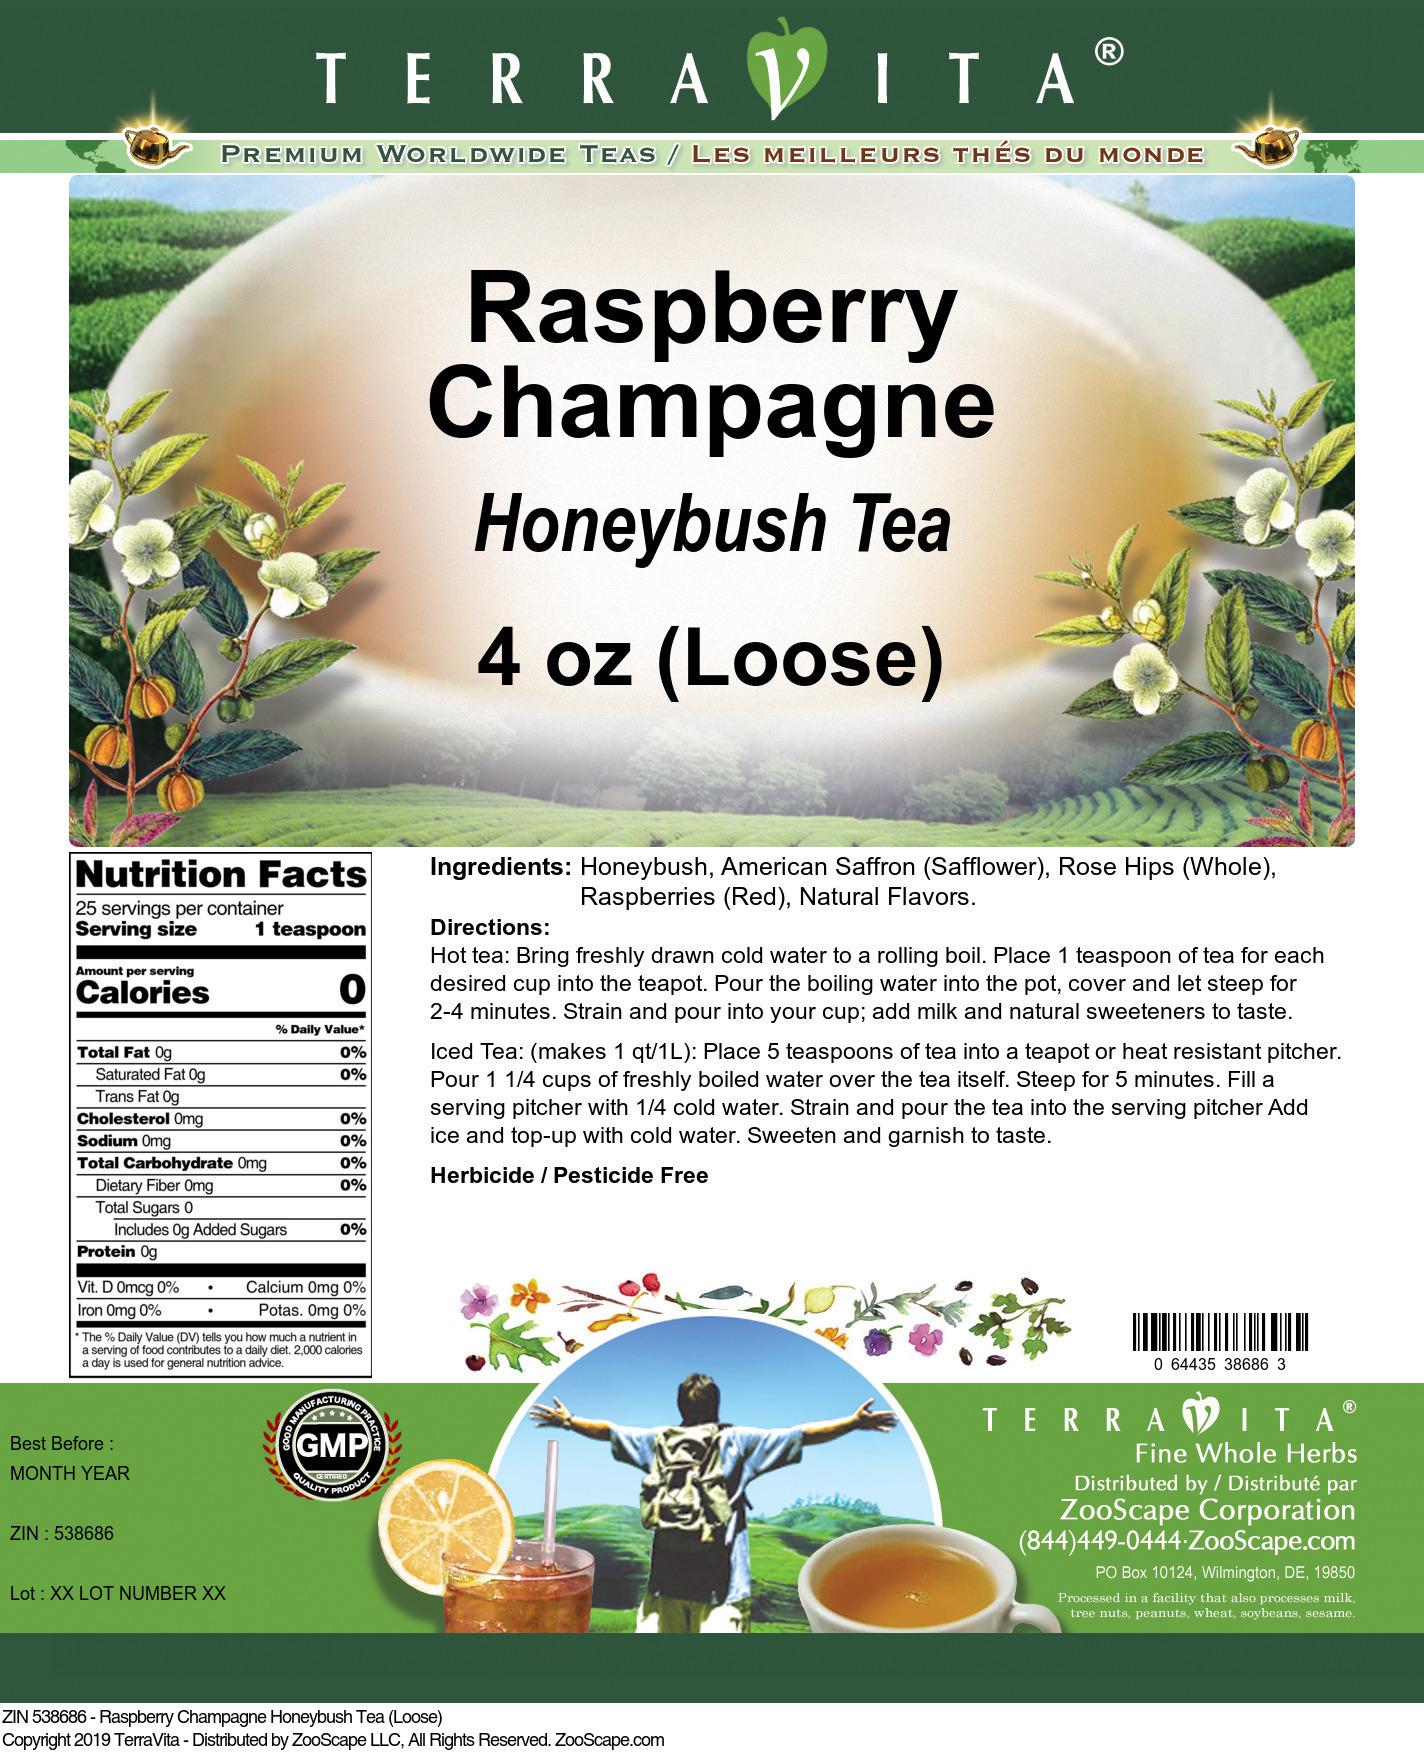 Raspberry Champagne Honeybush Tea (Loose)